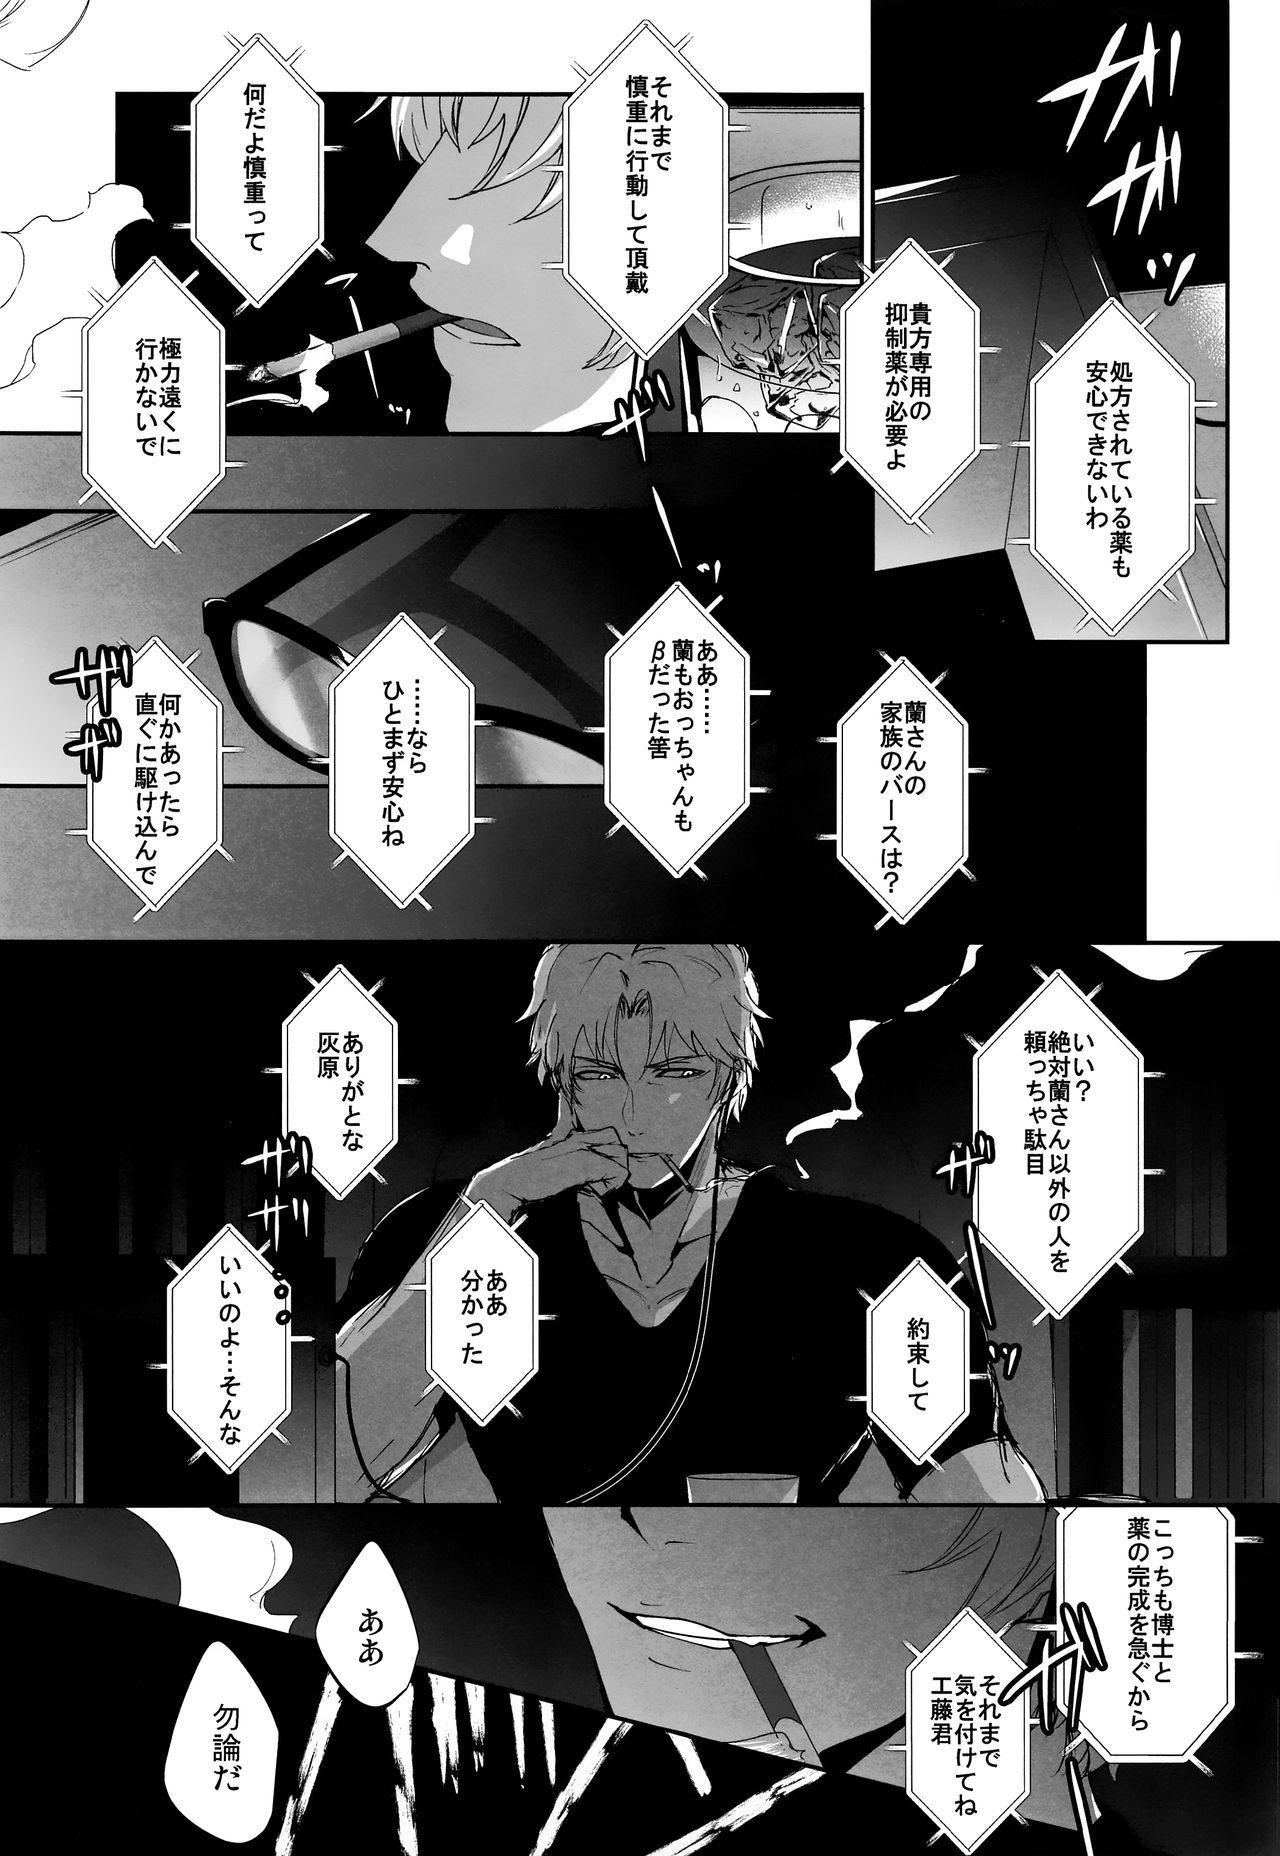 Kawaki 6